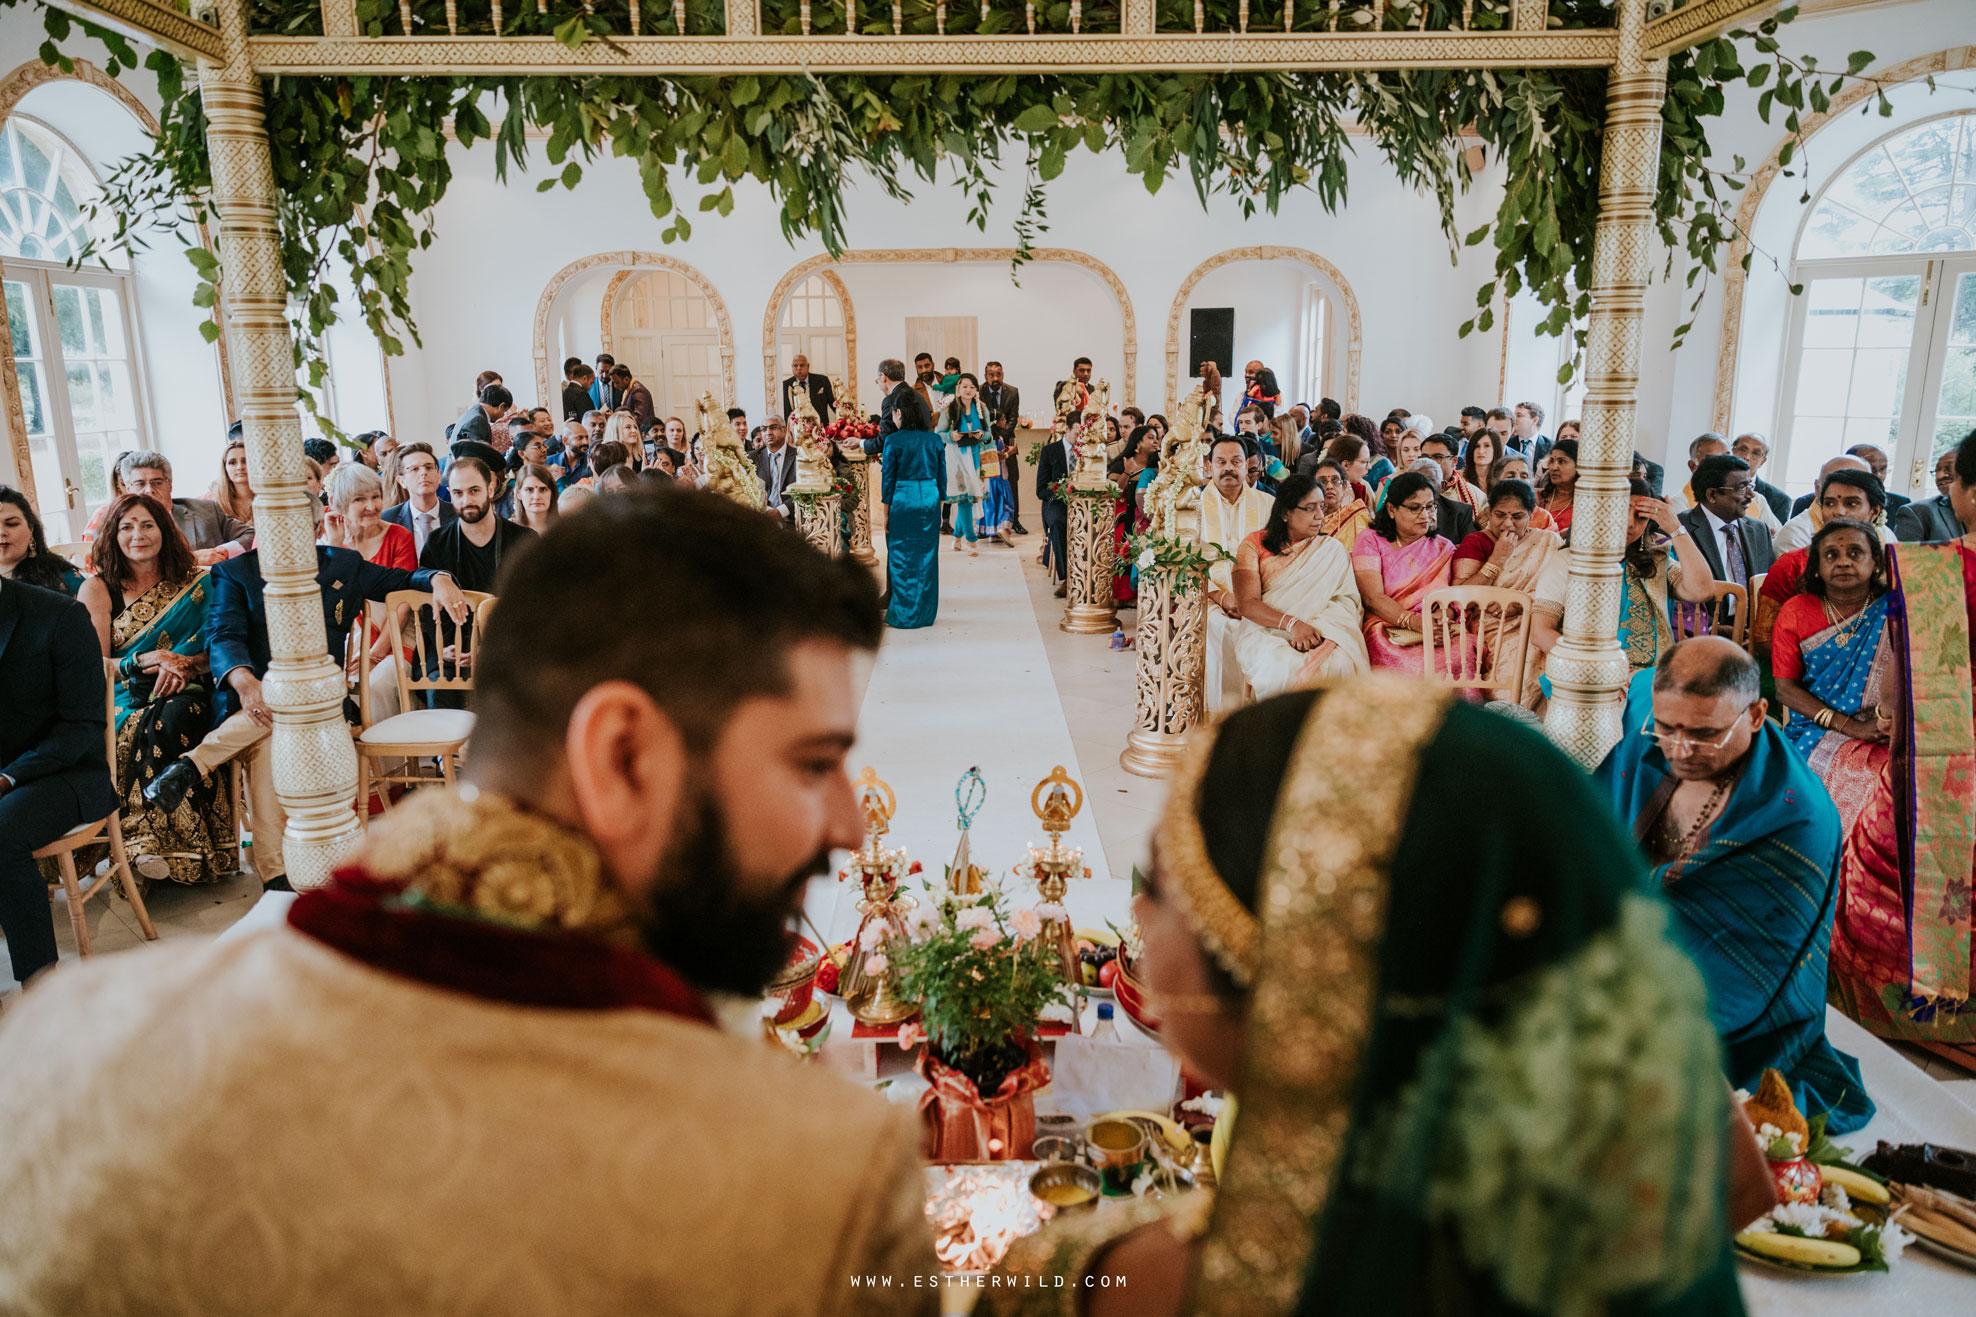 Northbrook_Park_Farnham_Surrey_London_Wedding_Hindu_Fusion_Esther_Wild_Photographer_IMG_4315.jpg